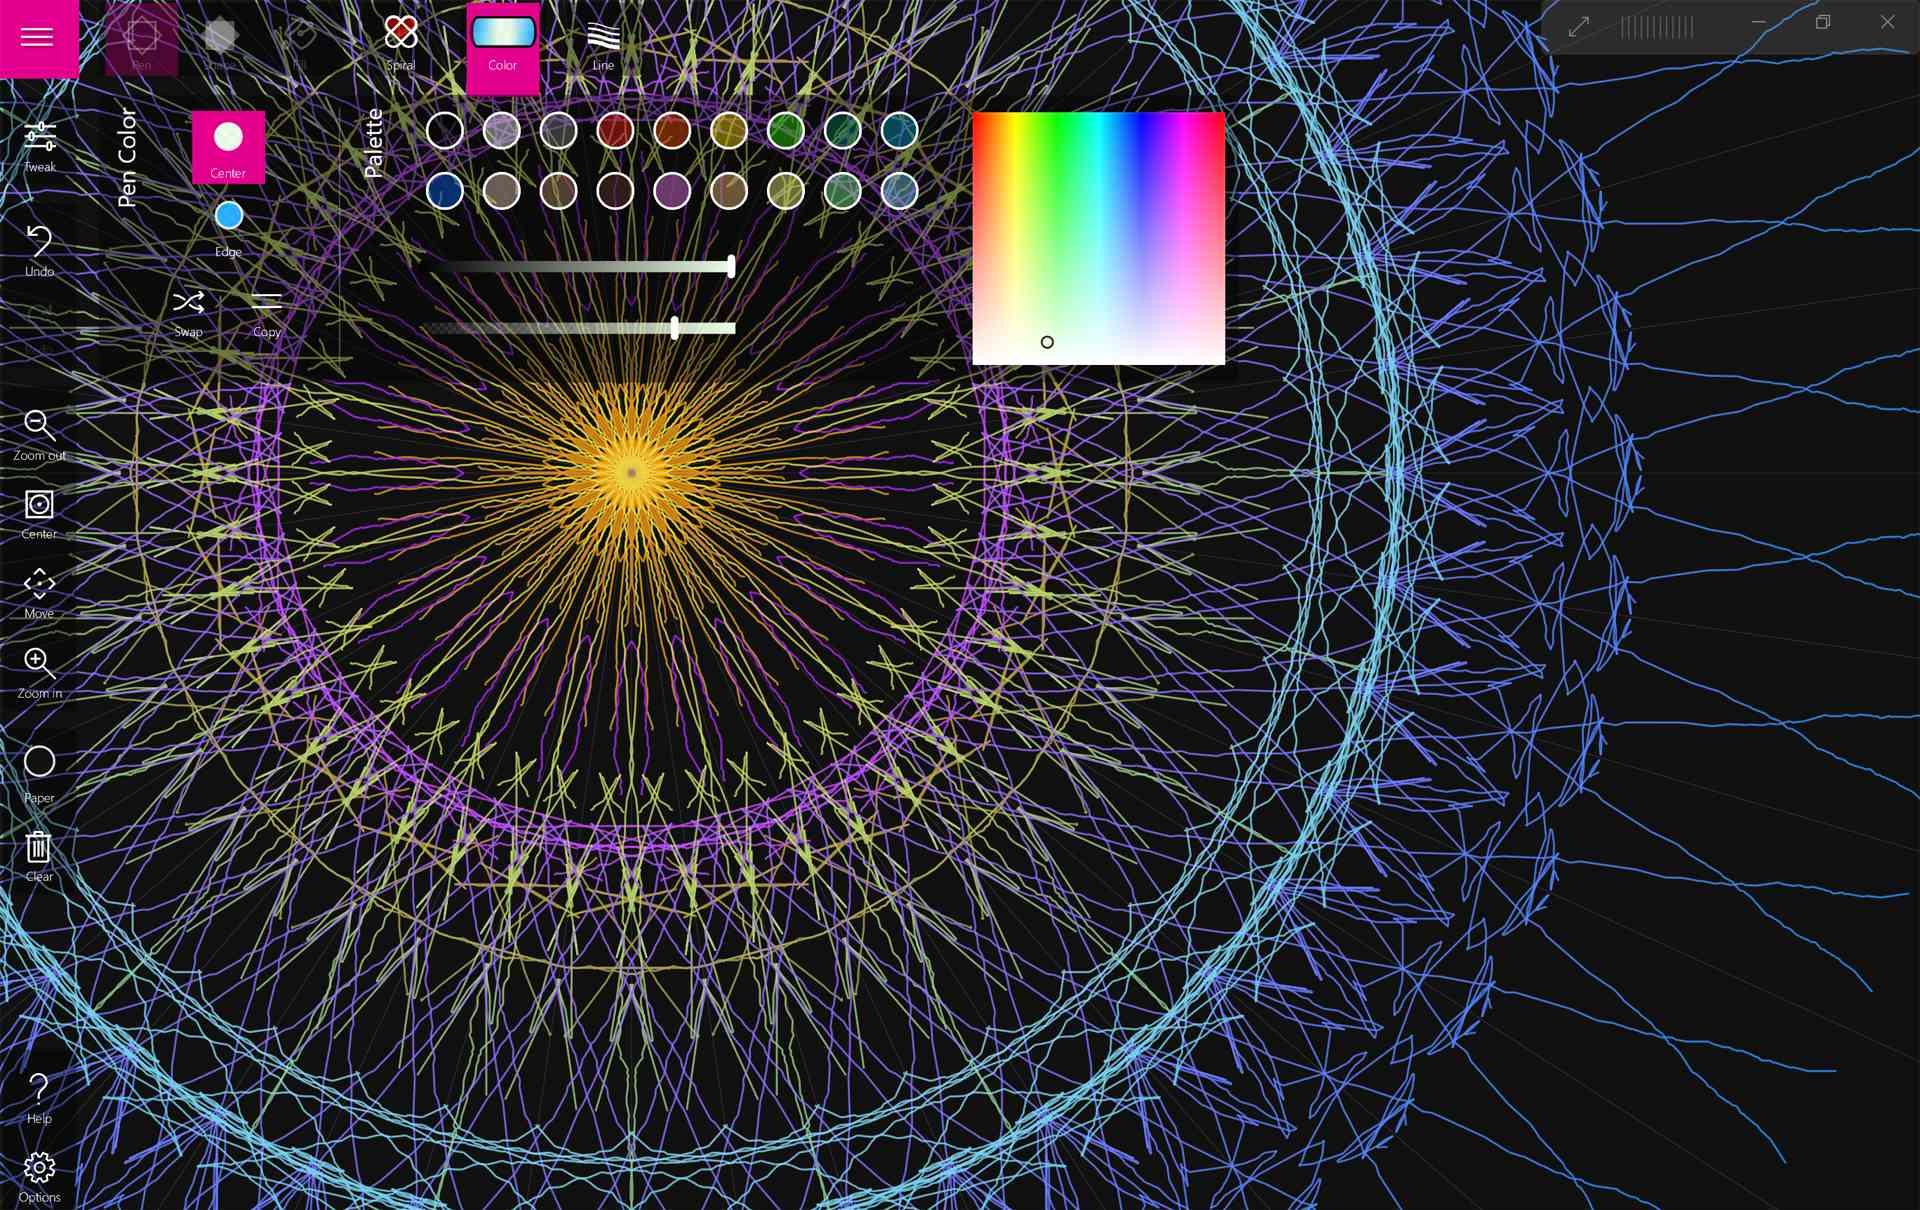 Spirality mandala drawing app for Surface Pro.